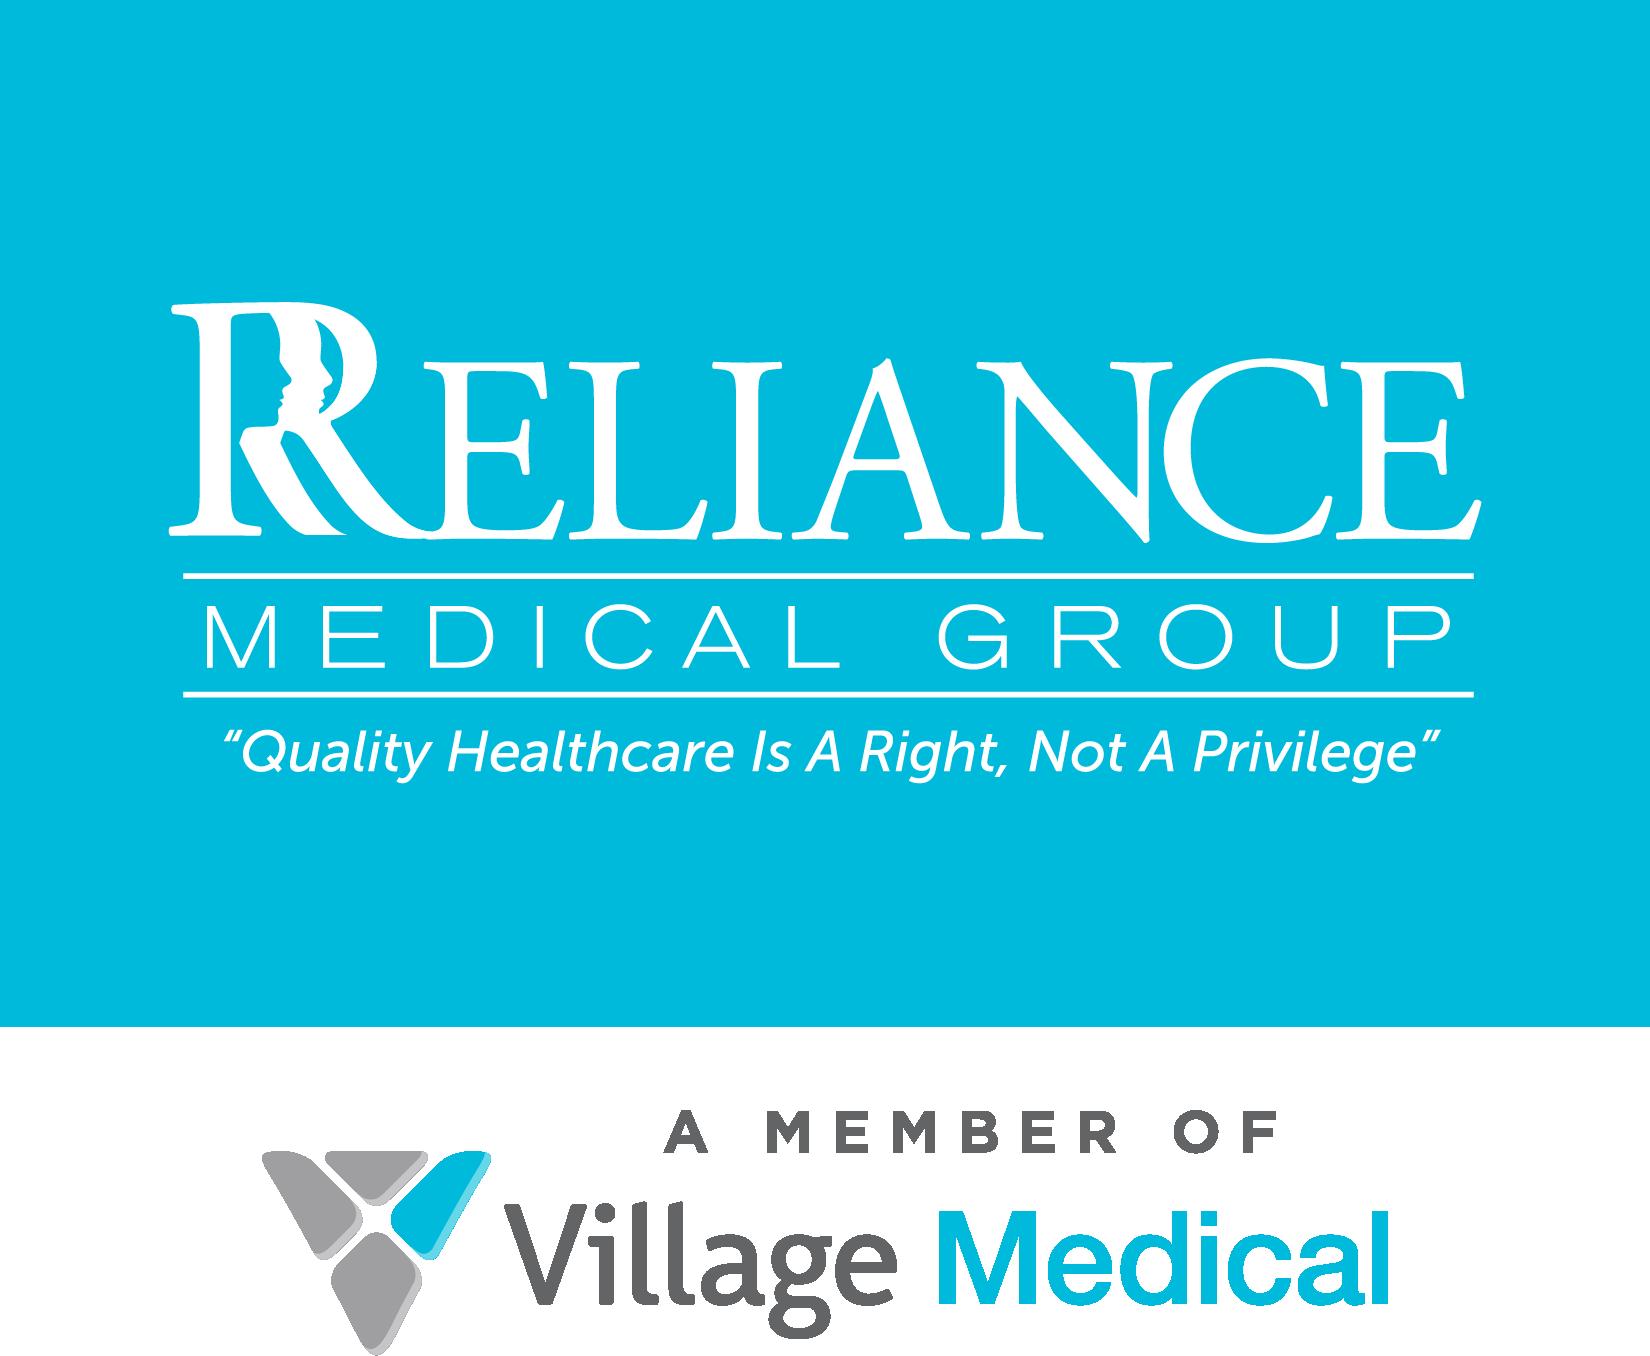 Village Medical - 602 S. Broadway,  Camden, NJ, 08103.